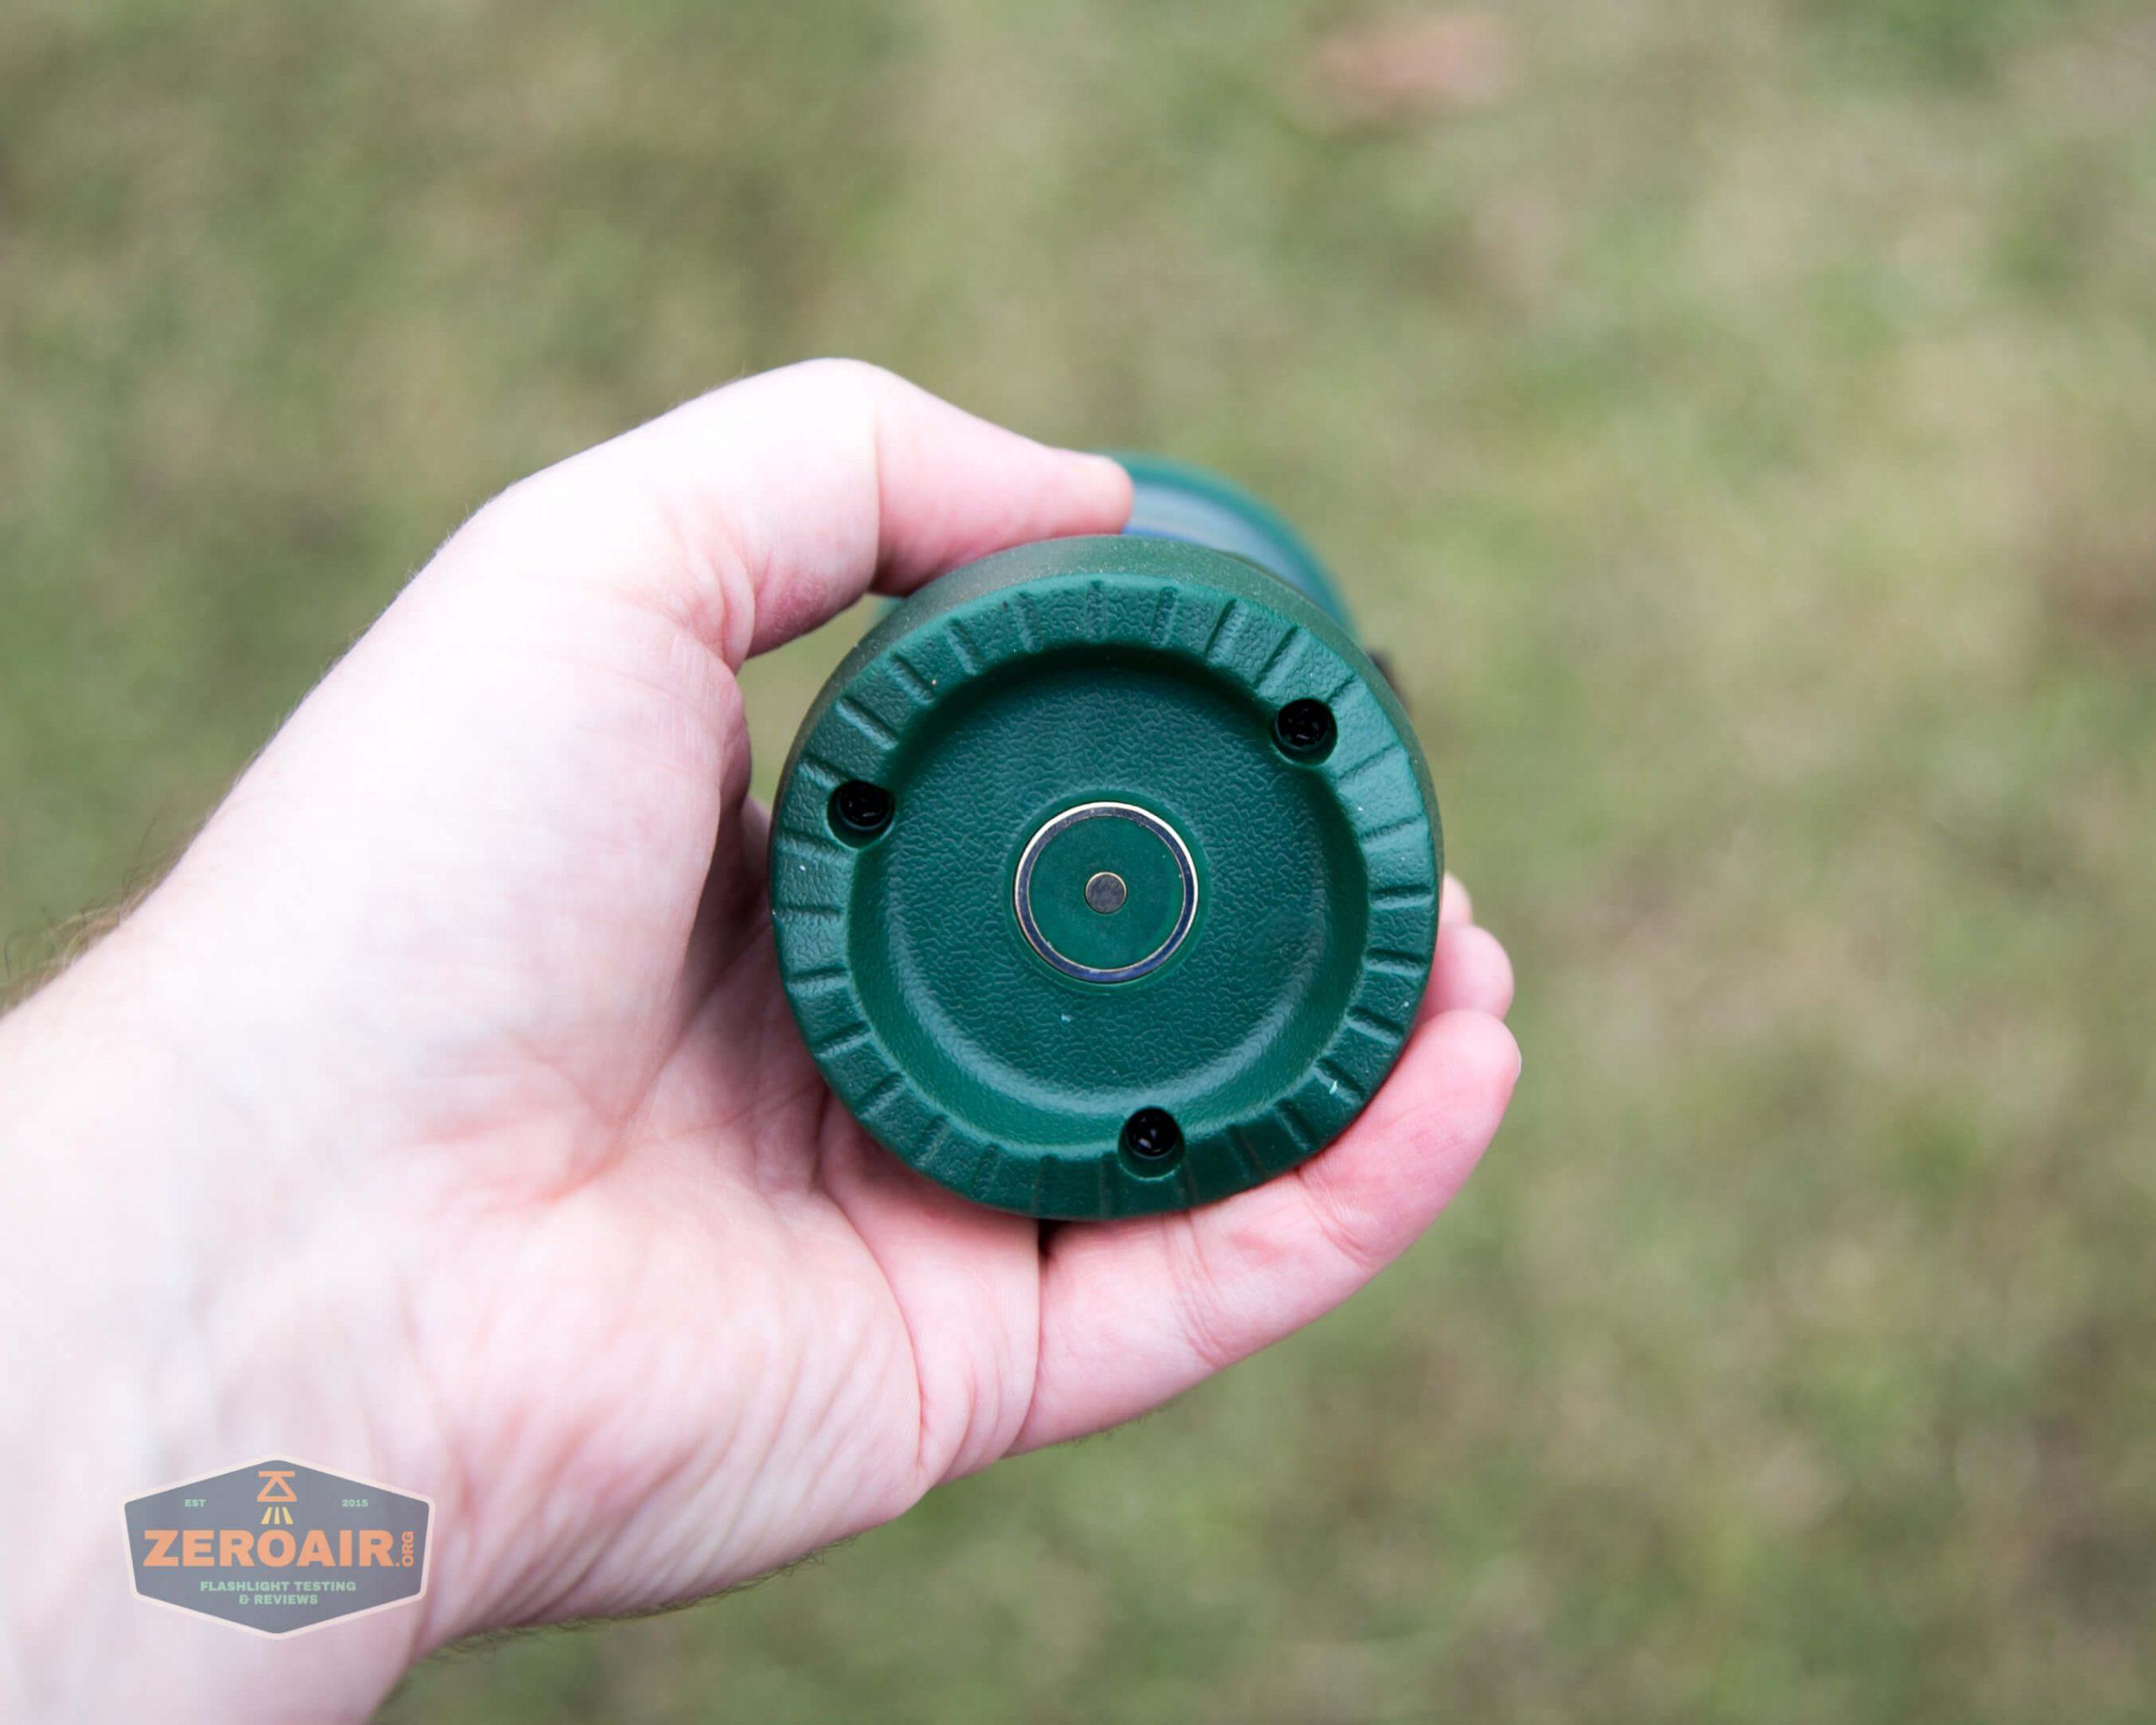 olight olantern lantern in hand base showing